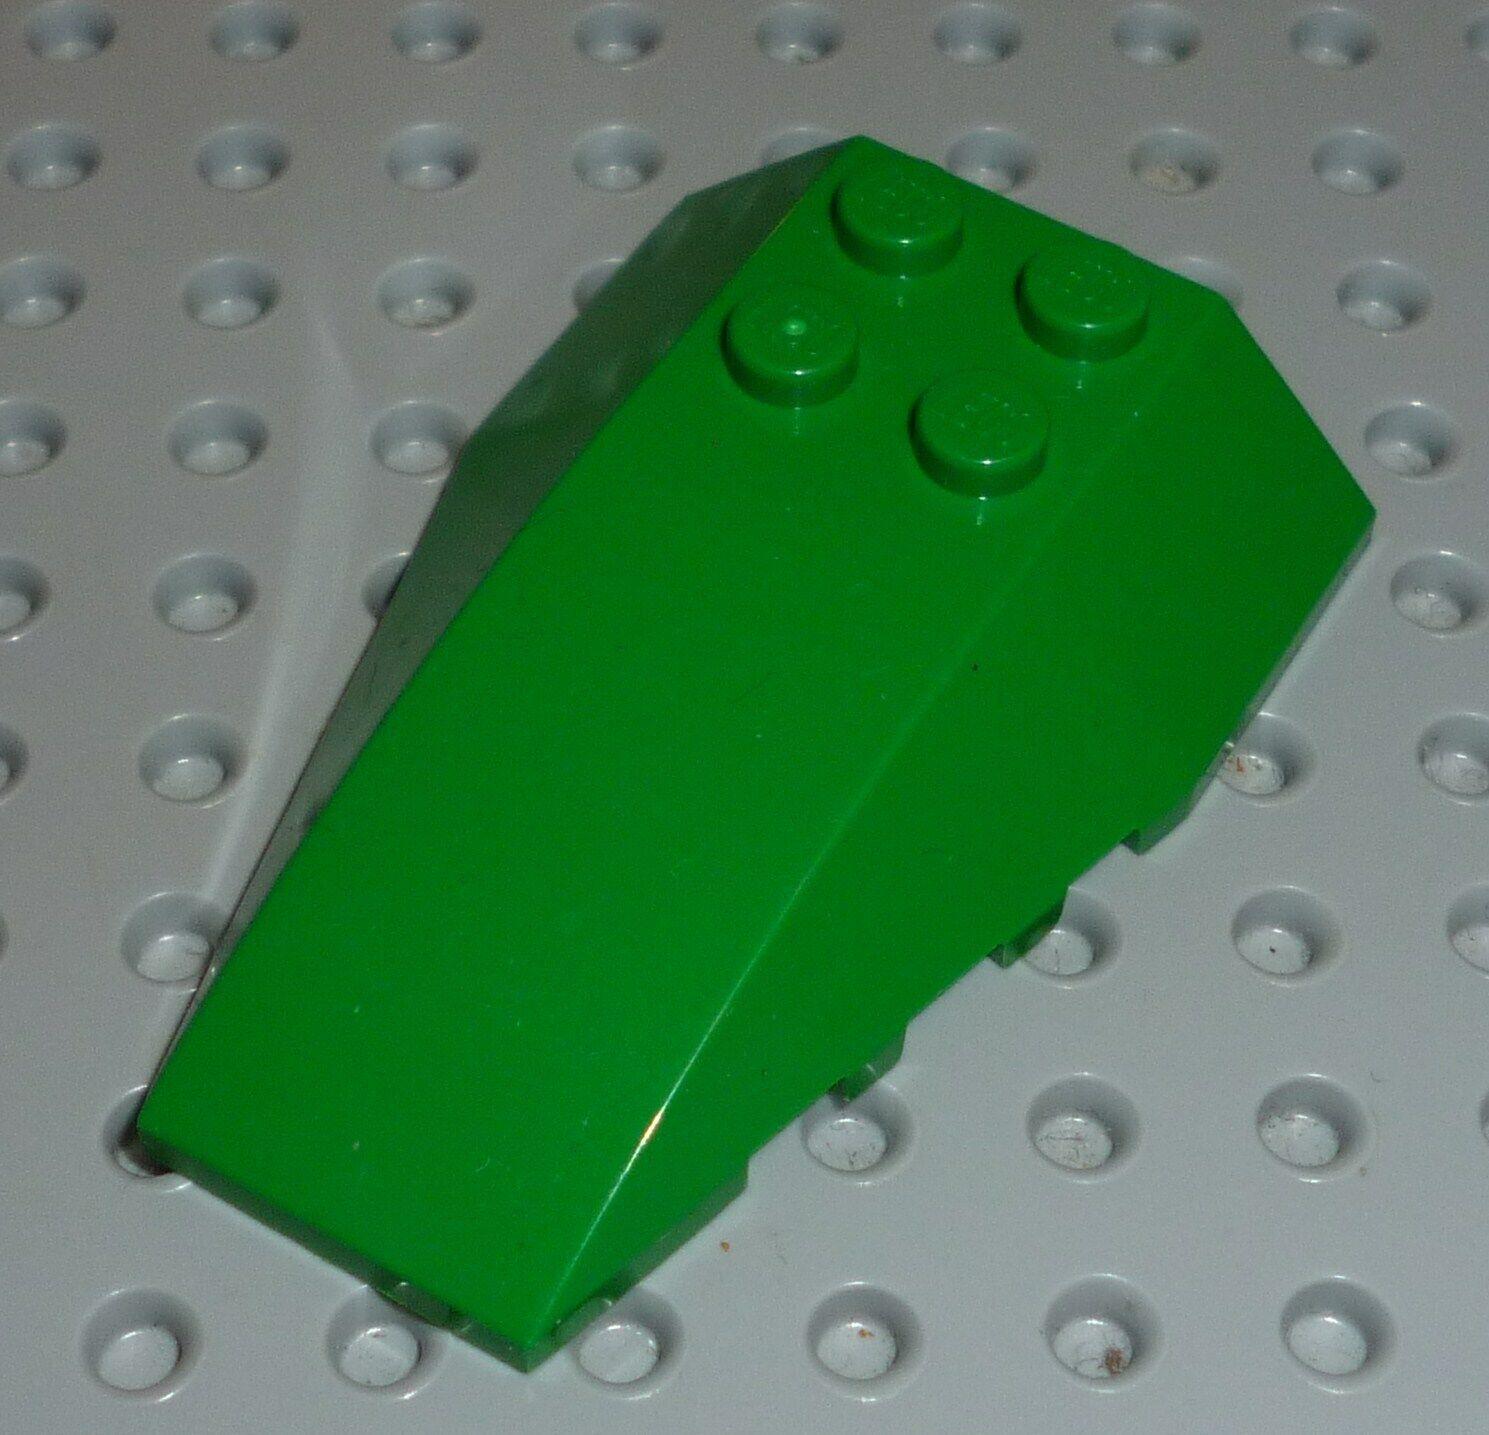 LEGO 43712 Choose Colour J2 Part no WEDGE BRICK Wedge 6 x 4 Triple Curved